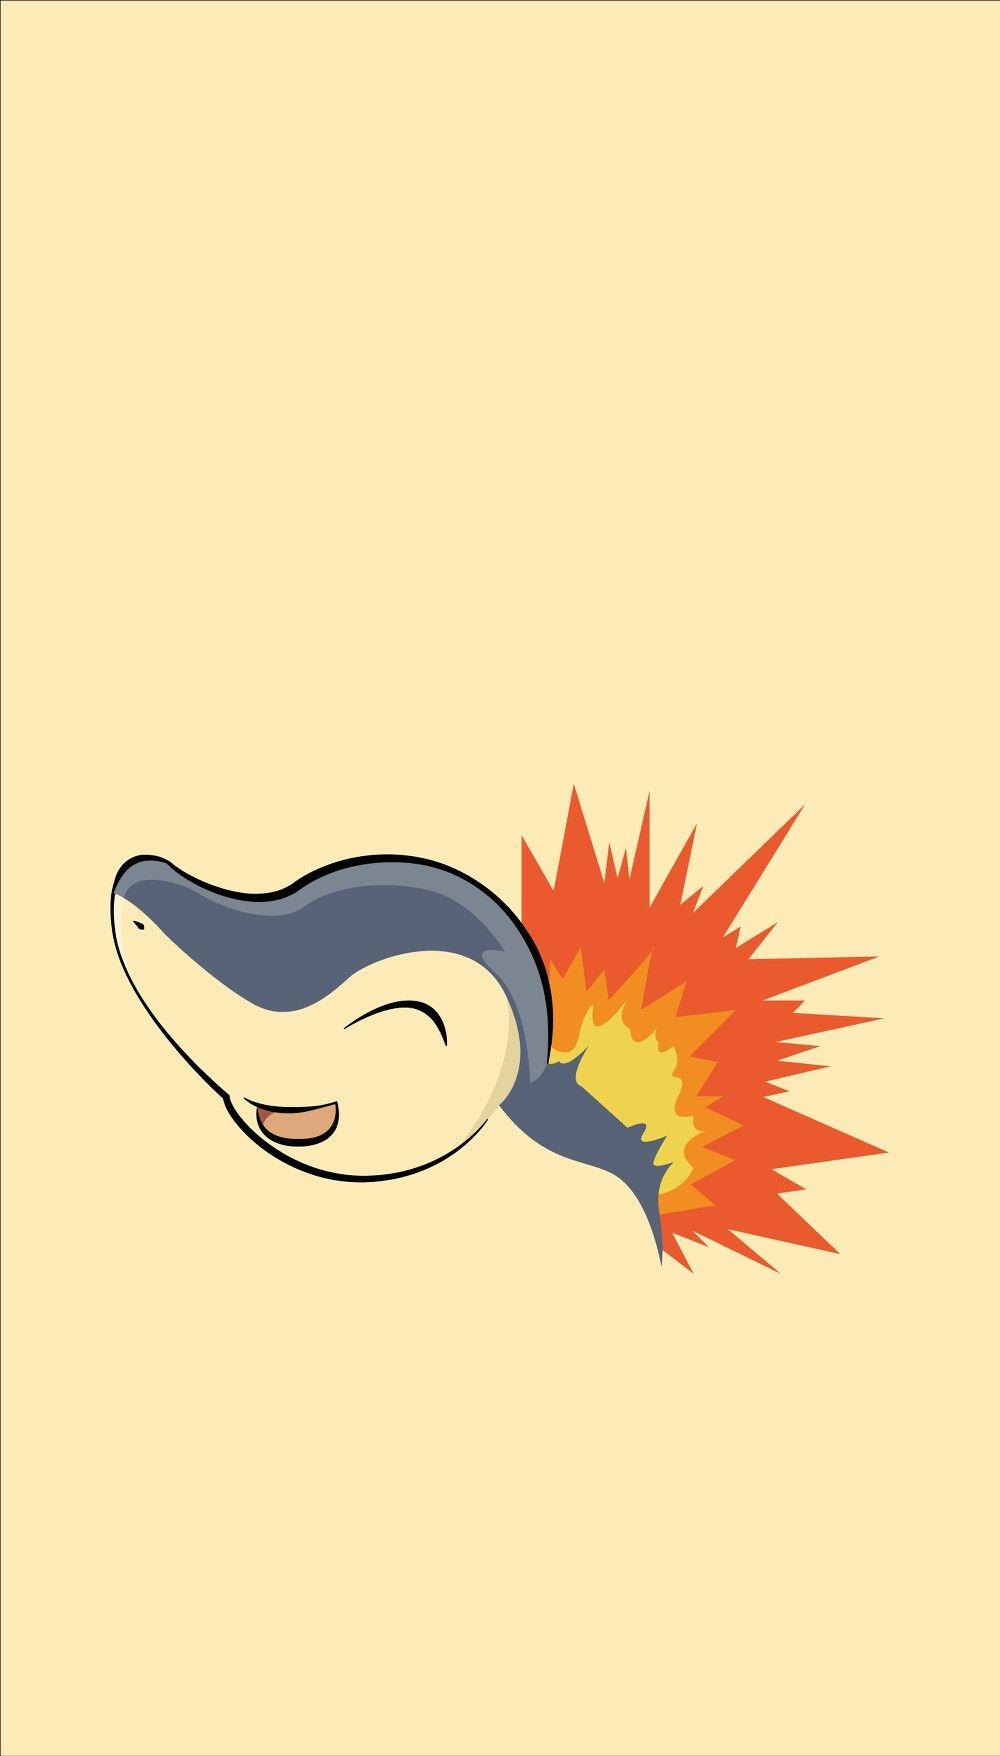 Cyndaquil wallpaper ❤ | Pokémon (ノ◕ヮ◕)ノ*:・゚✧ | Pinterest …